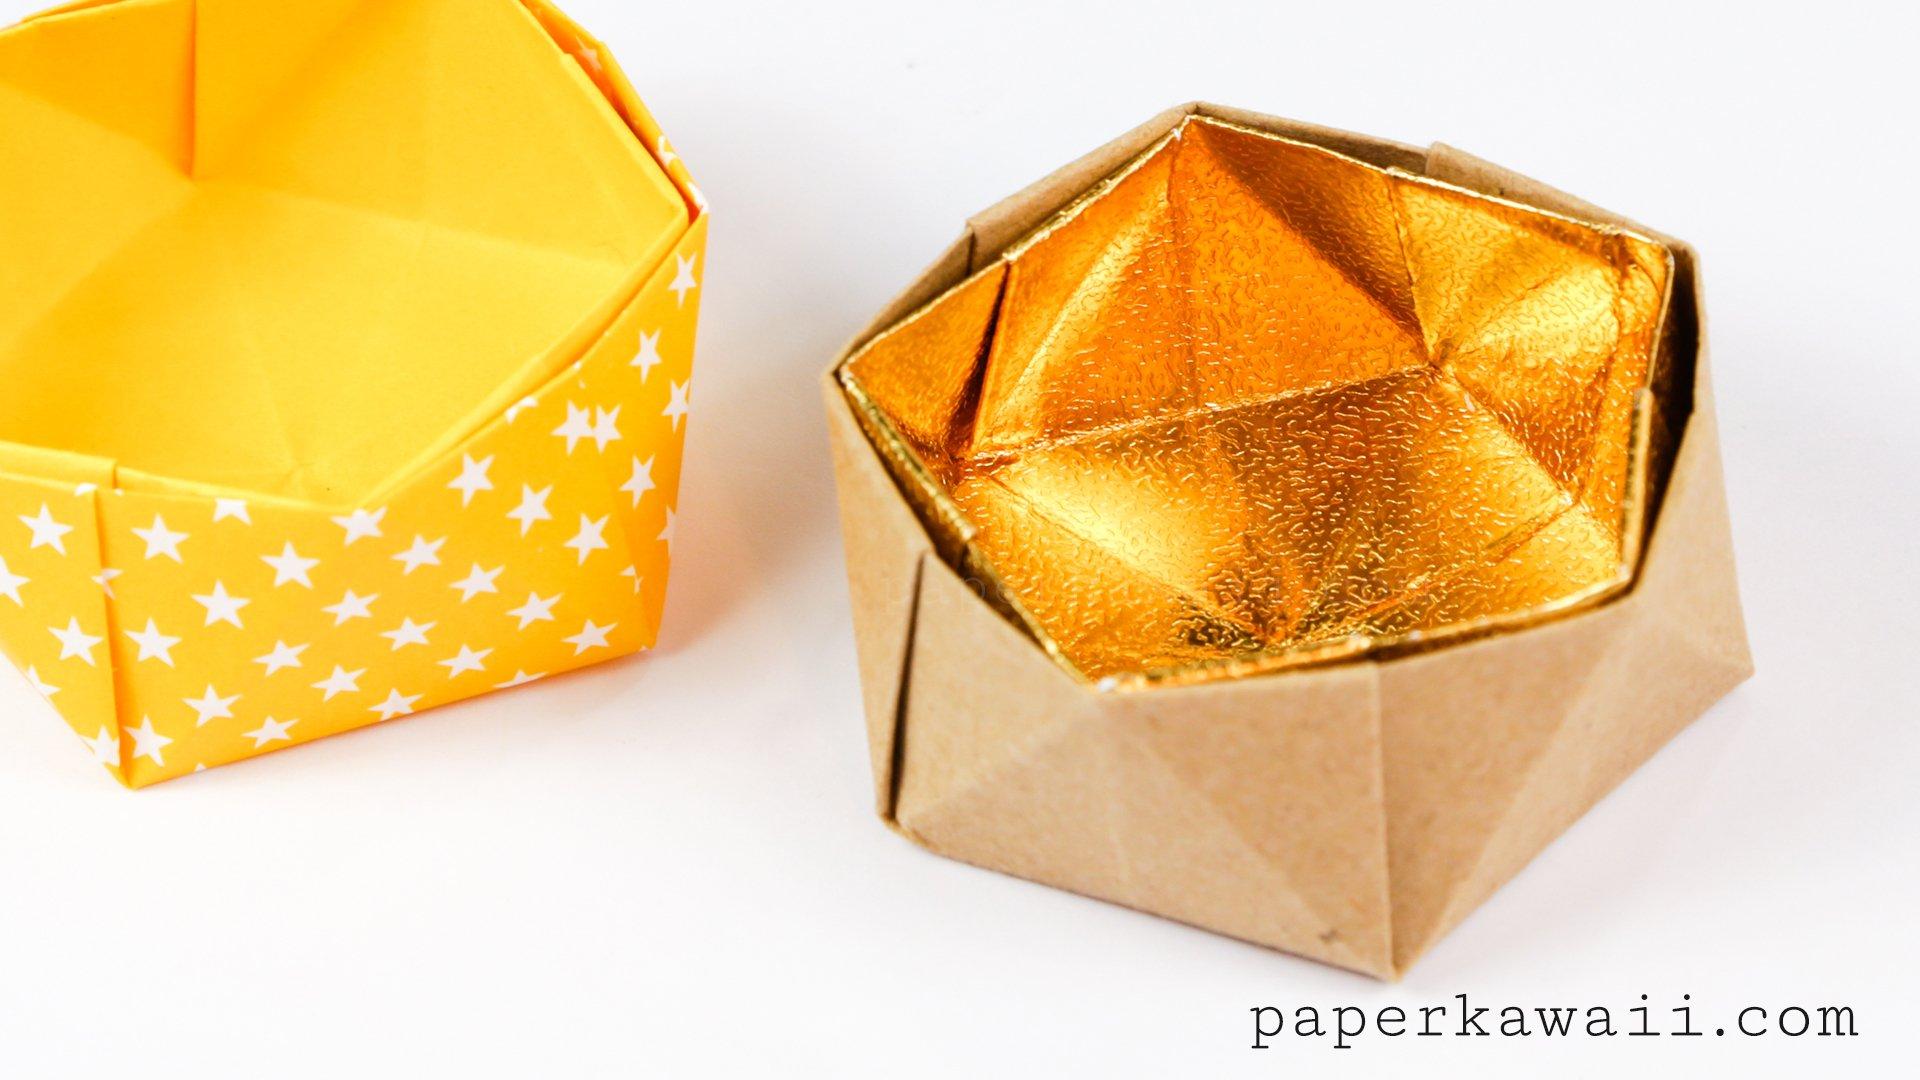 Geometric Origami Bowl Instructions Paper Kawaii